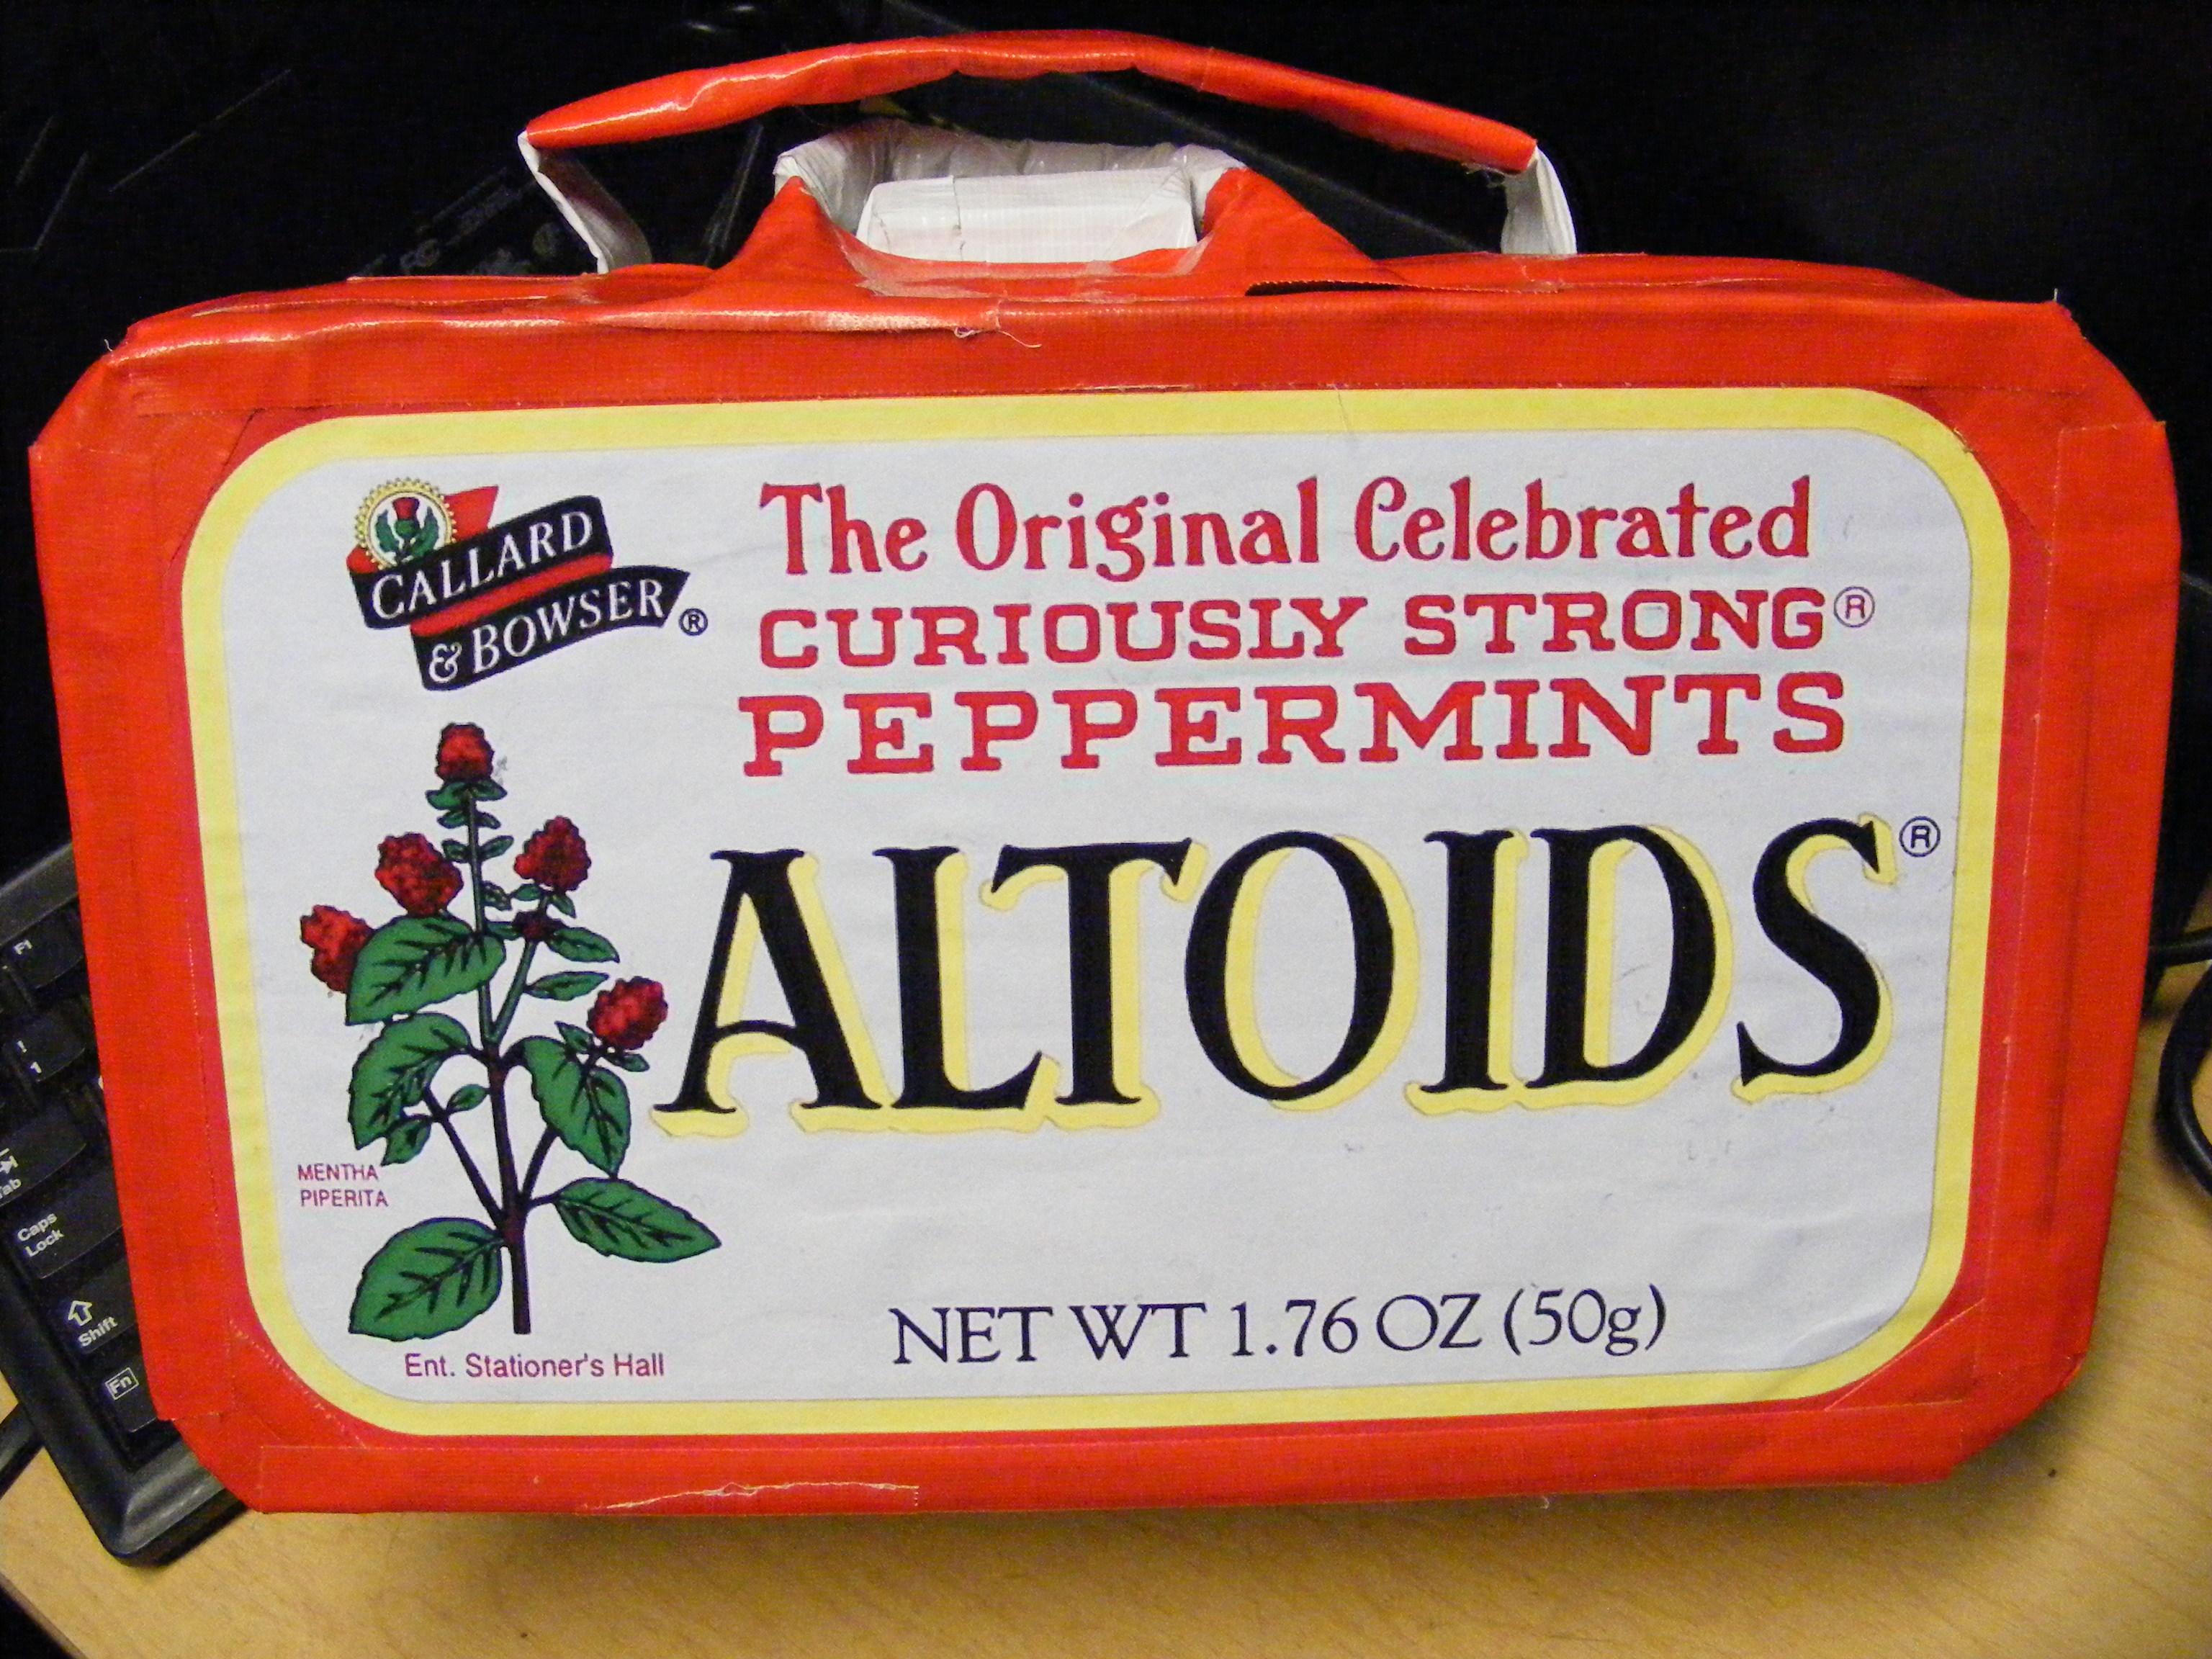 bumpus' Giant Altoids Subway turkey sammich holder (Giant Altoids Tin Lunchbox)